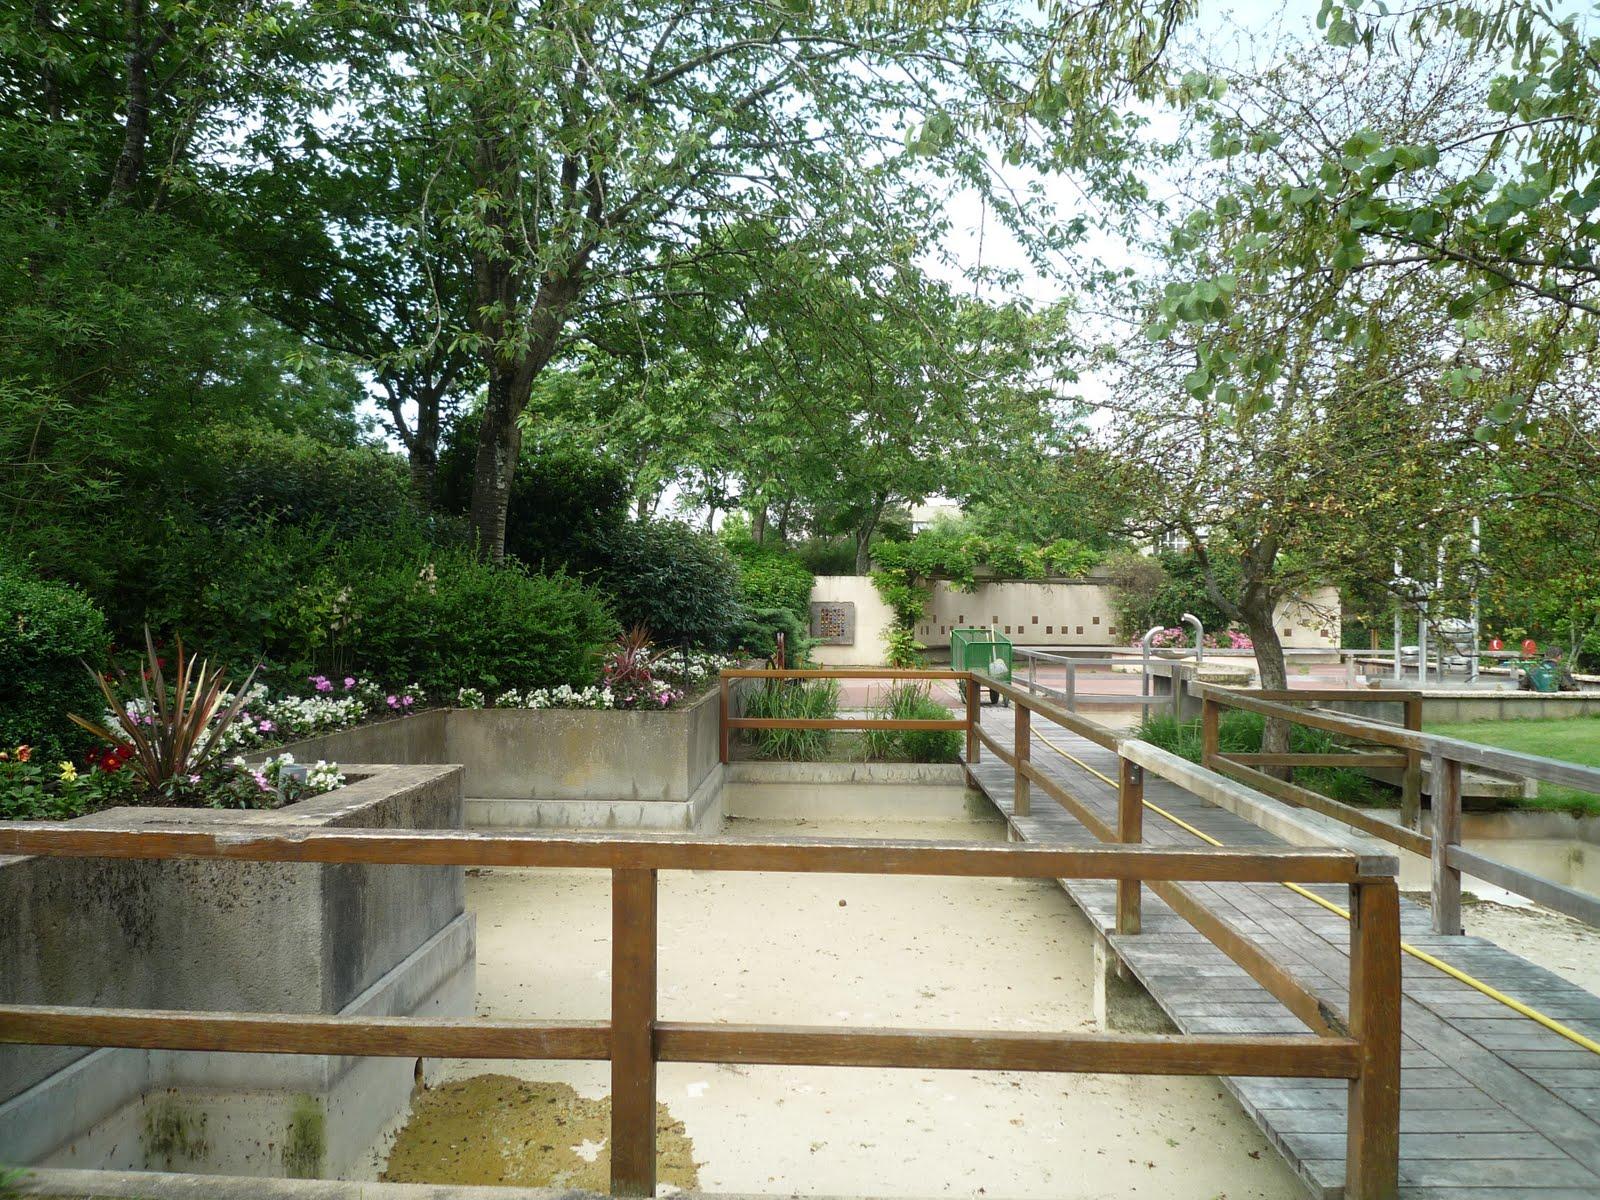 Espace photos jardin des 5 sens nantes for Jardin des 5 sens nantes